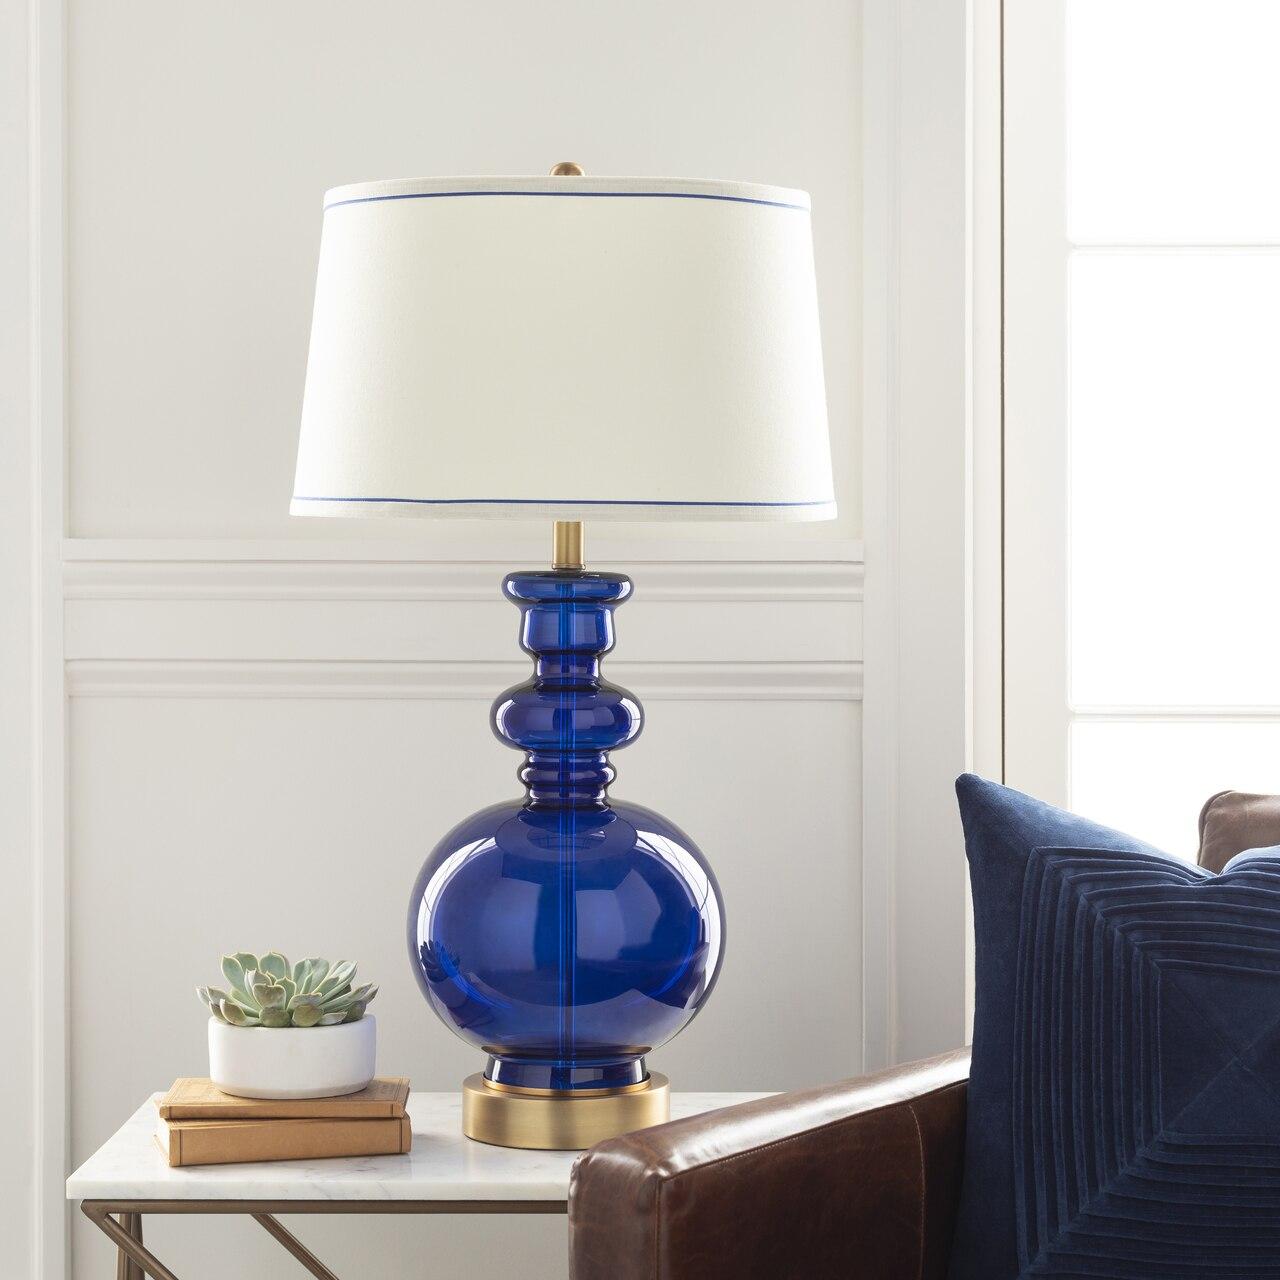 Lamps and Lighting - Save 15%!